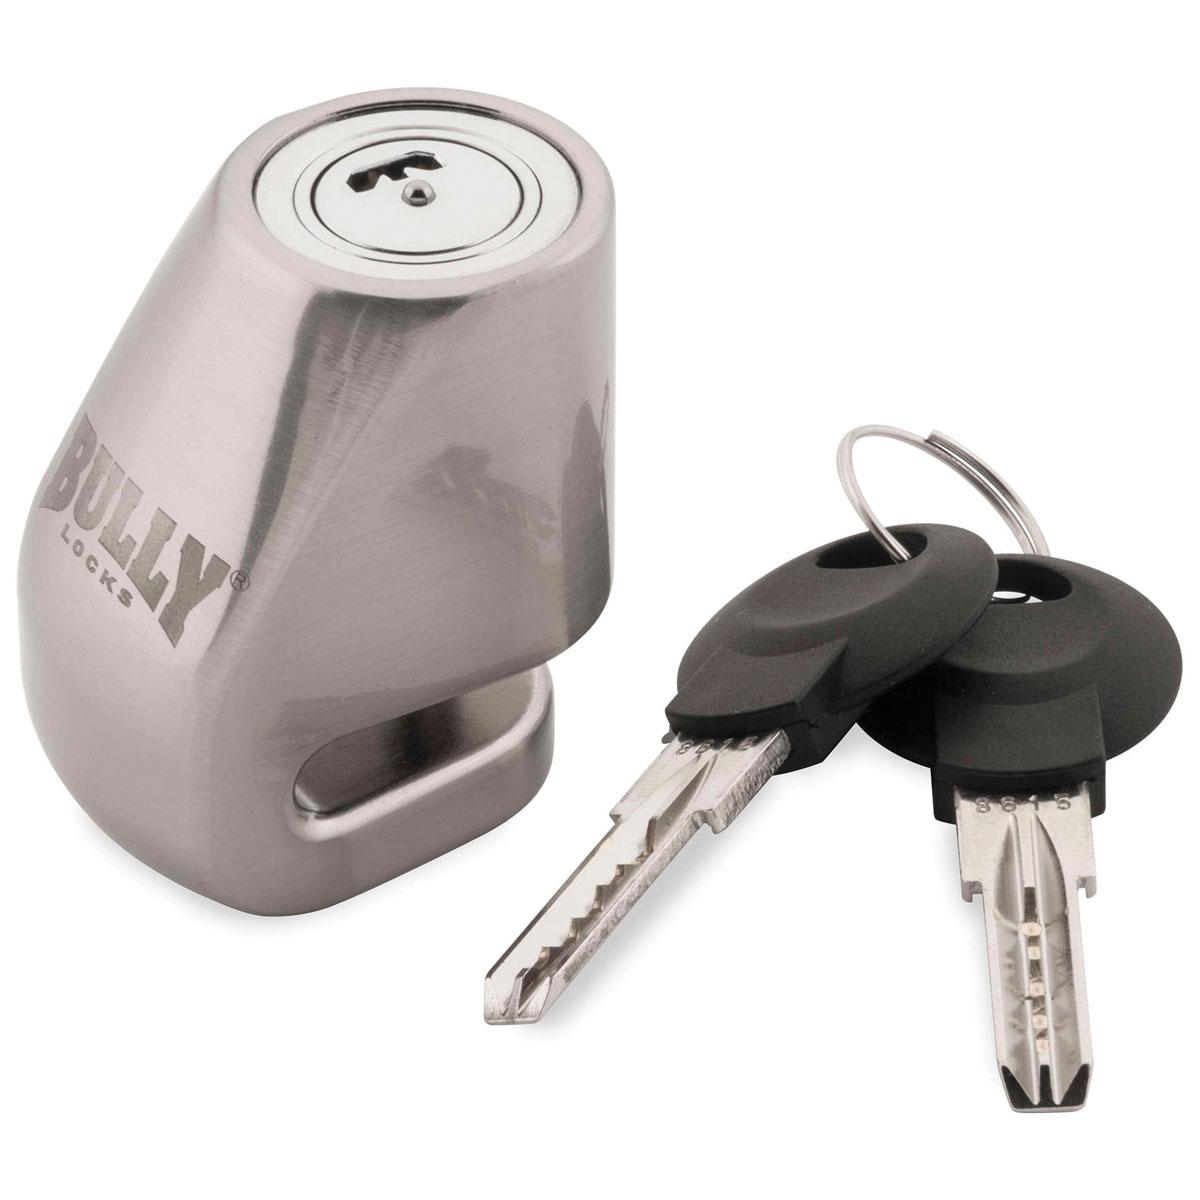 Bully 5.5mm Premium 12mm Throat Disc Lock